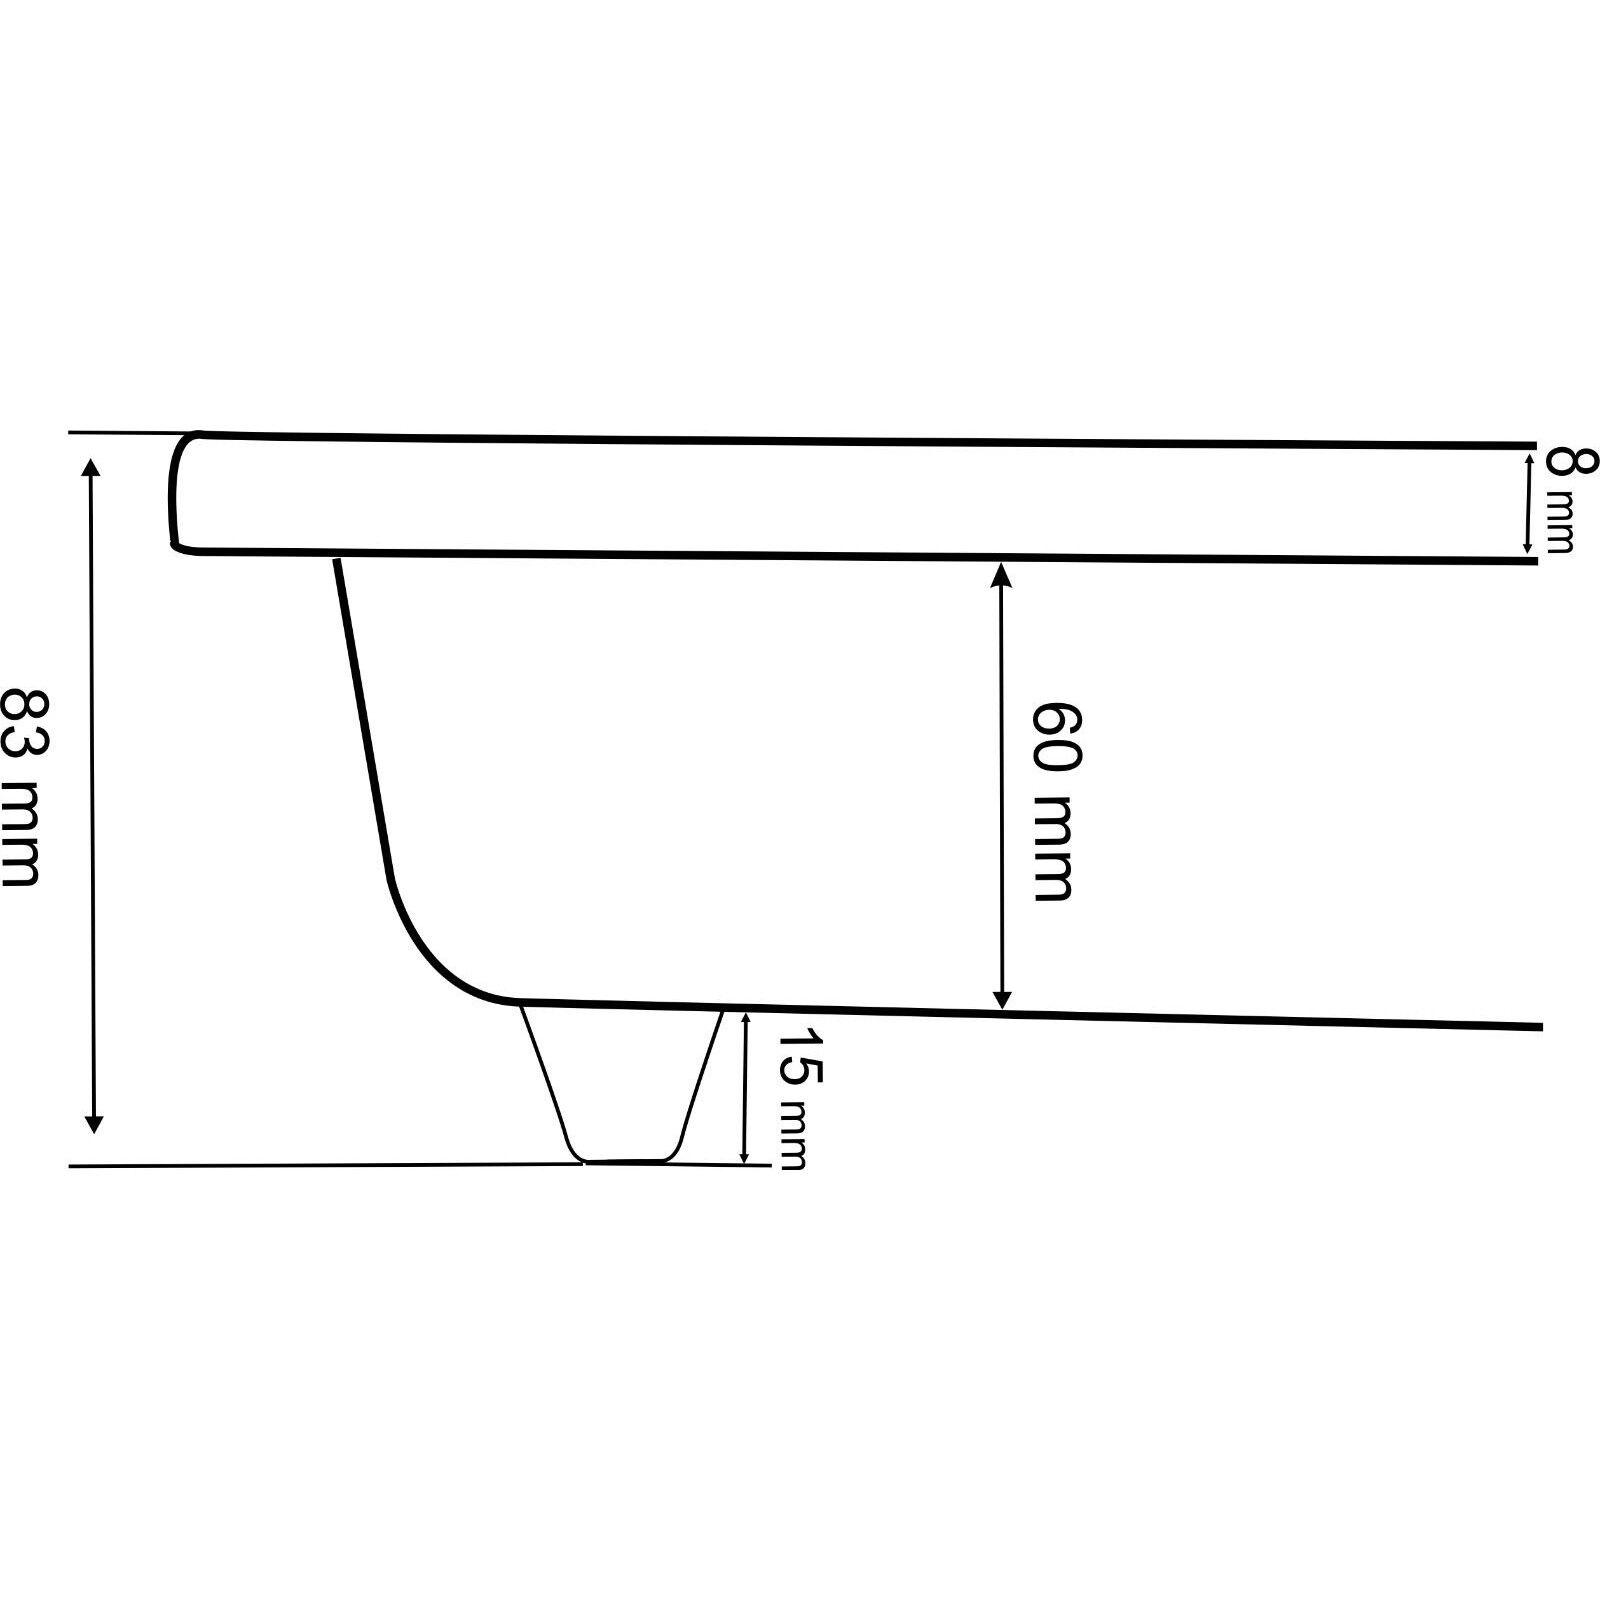 Domino-G 30cm Built-in Gas hob 2 Set burner Cook-top Weiß Glass + Gas Regulator Set 2 b1348a